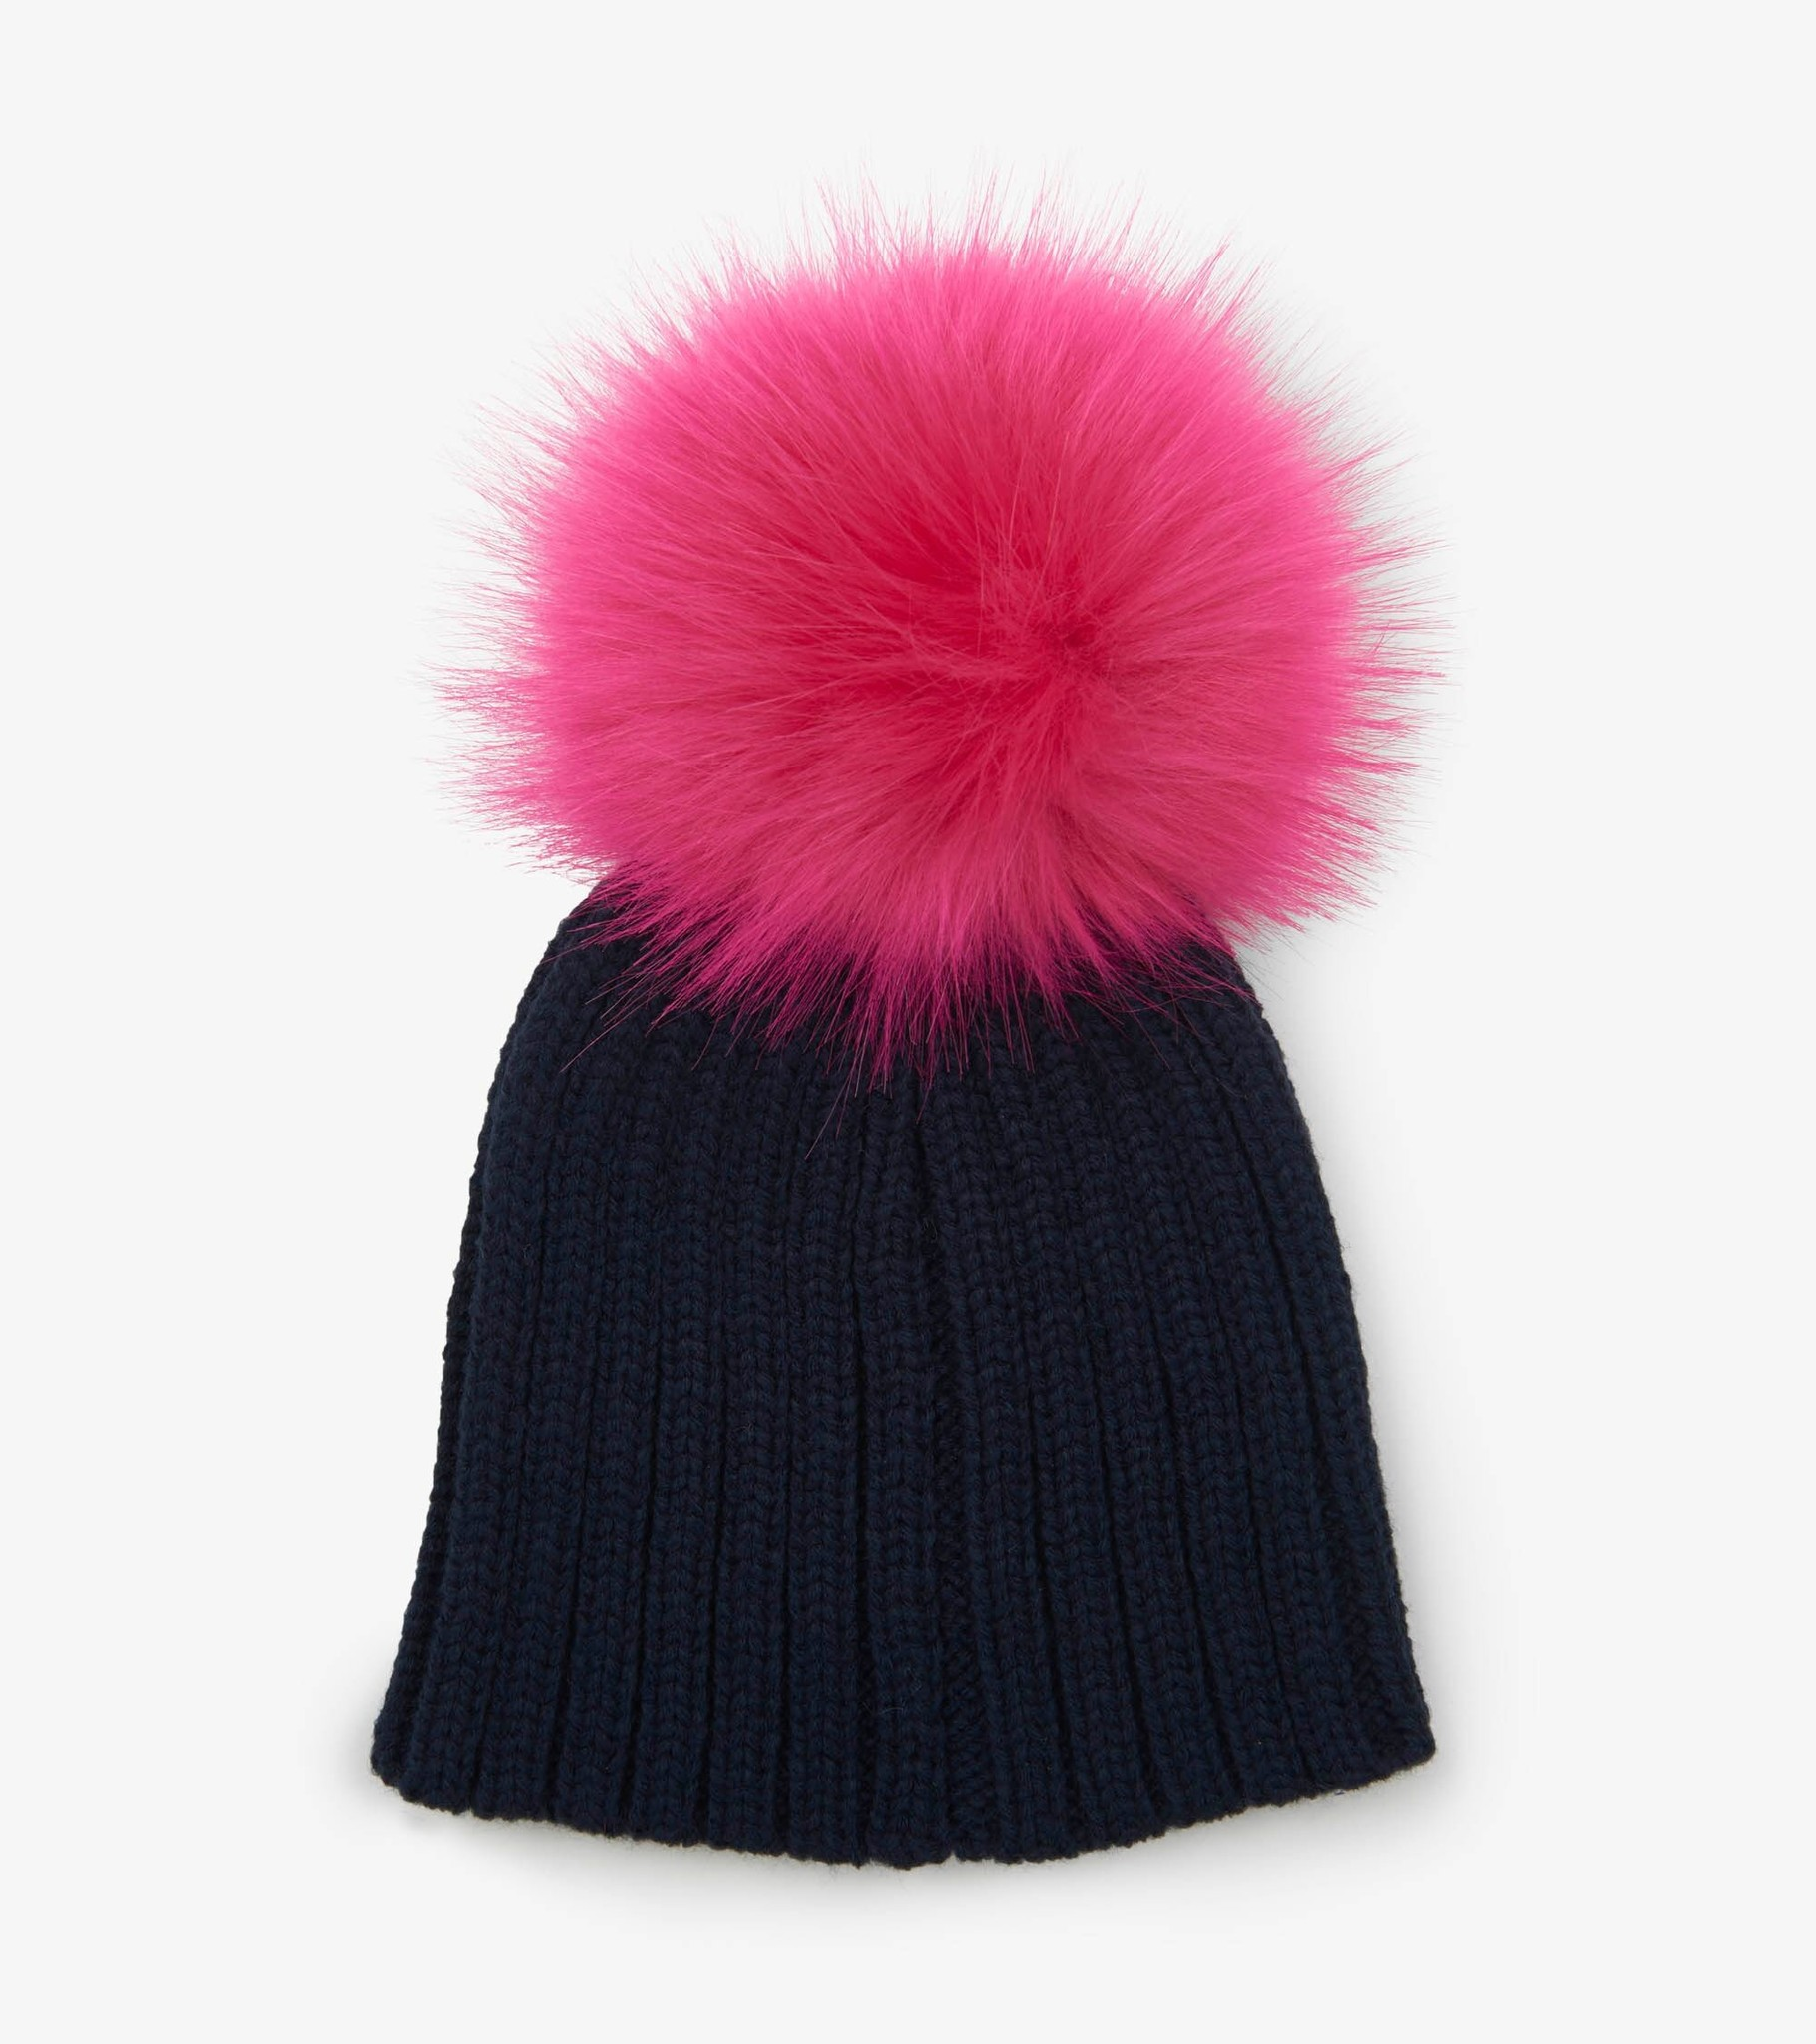 Hatley Hatley Pink Pom Pom Winter Hat